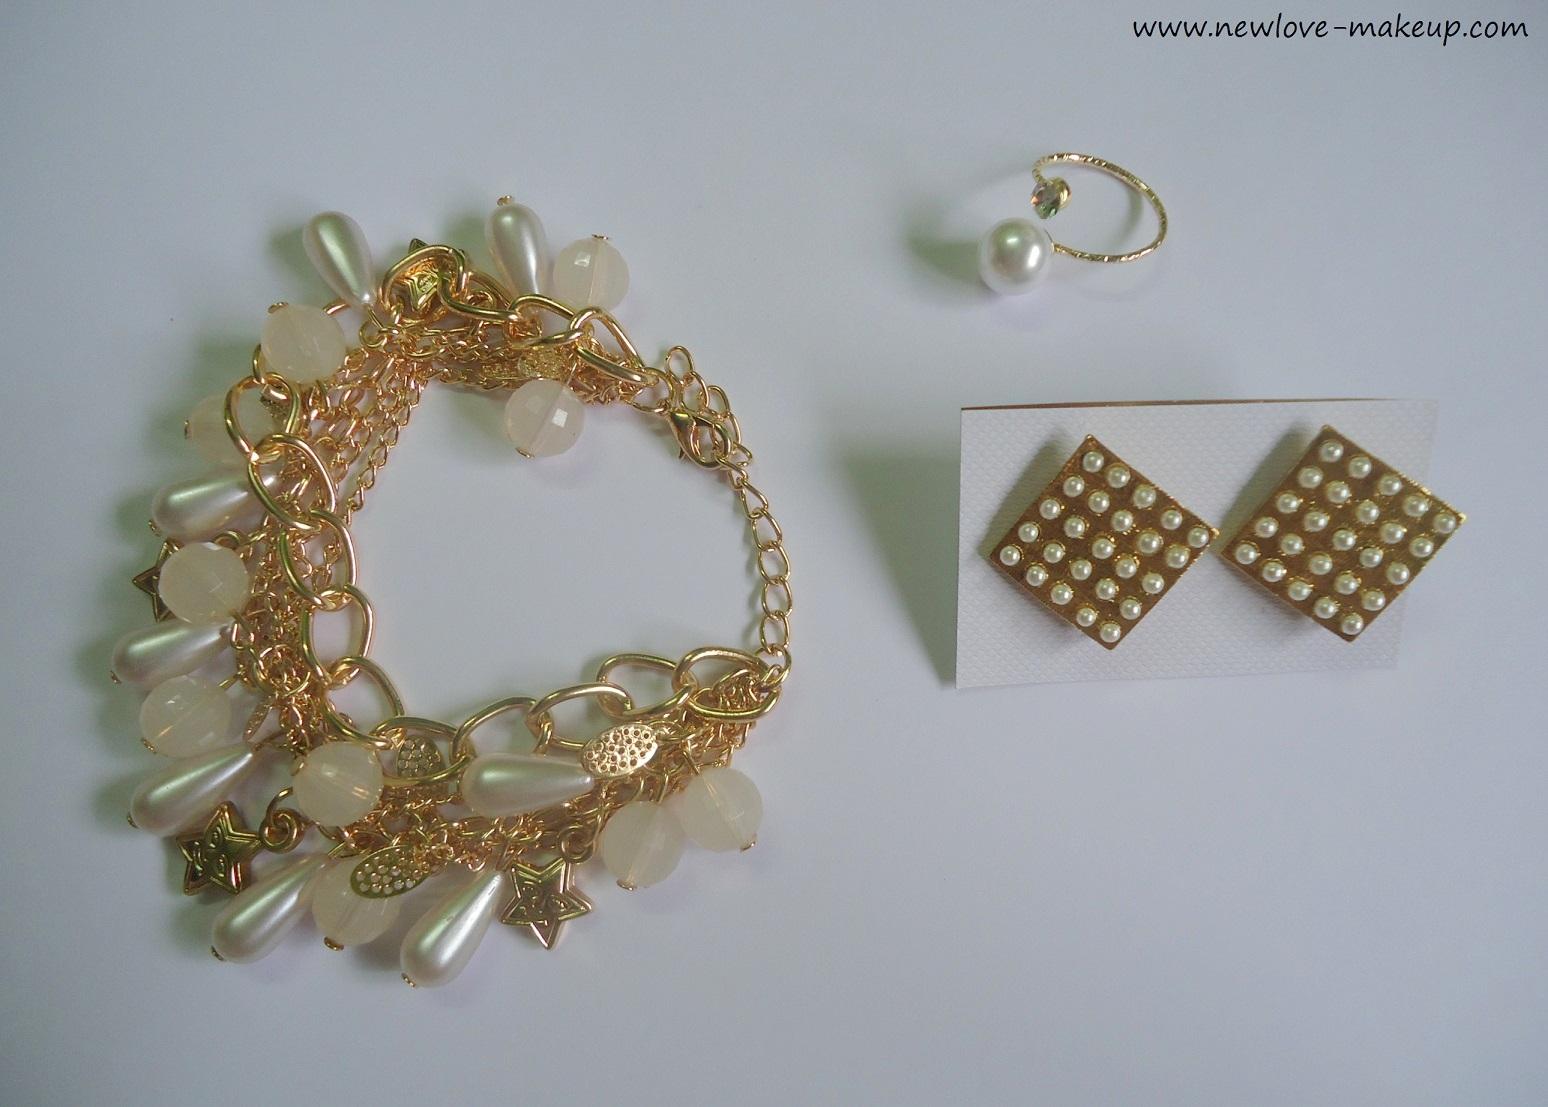 ae71bb523 Jewellery Haul from La Elegante' | New Love - Makeup